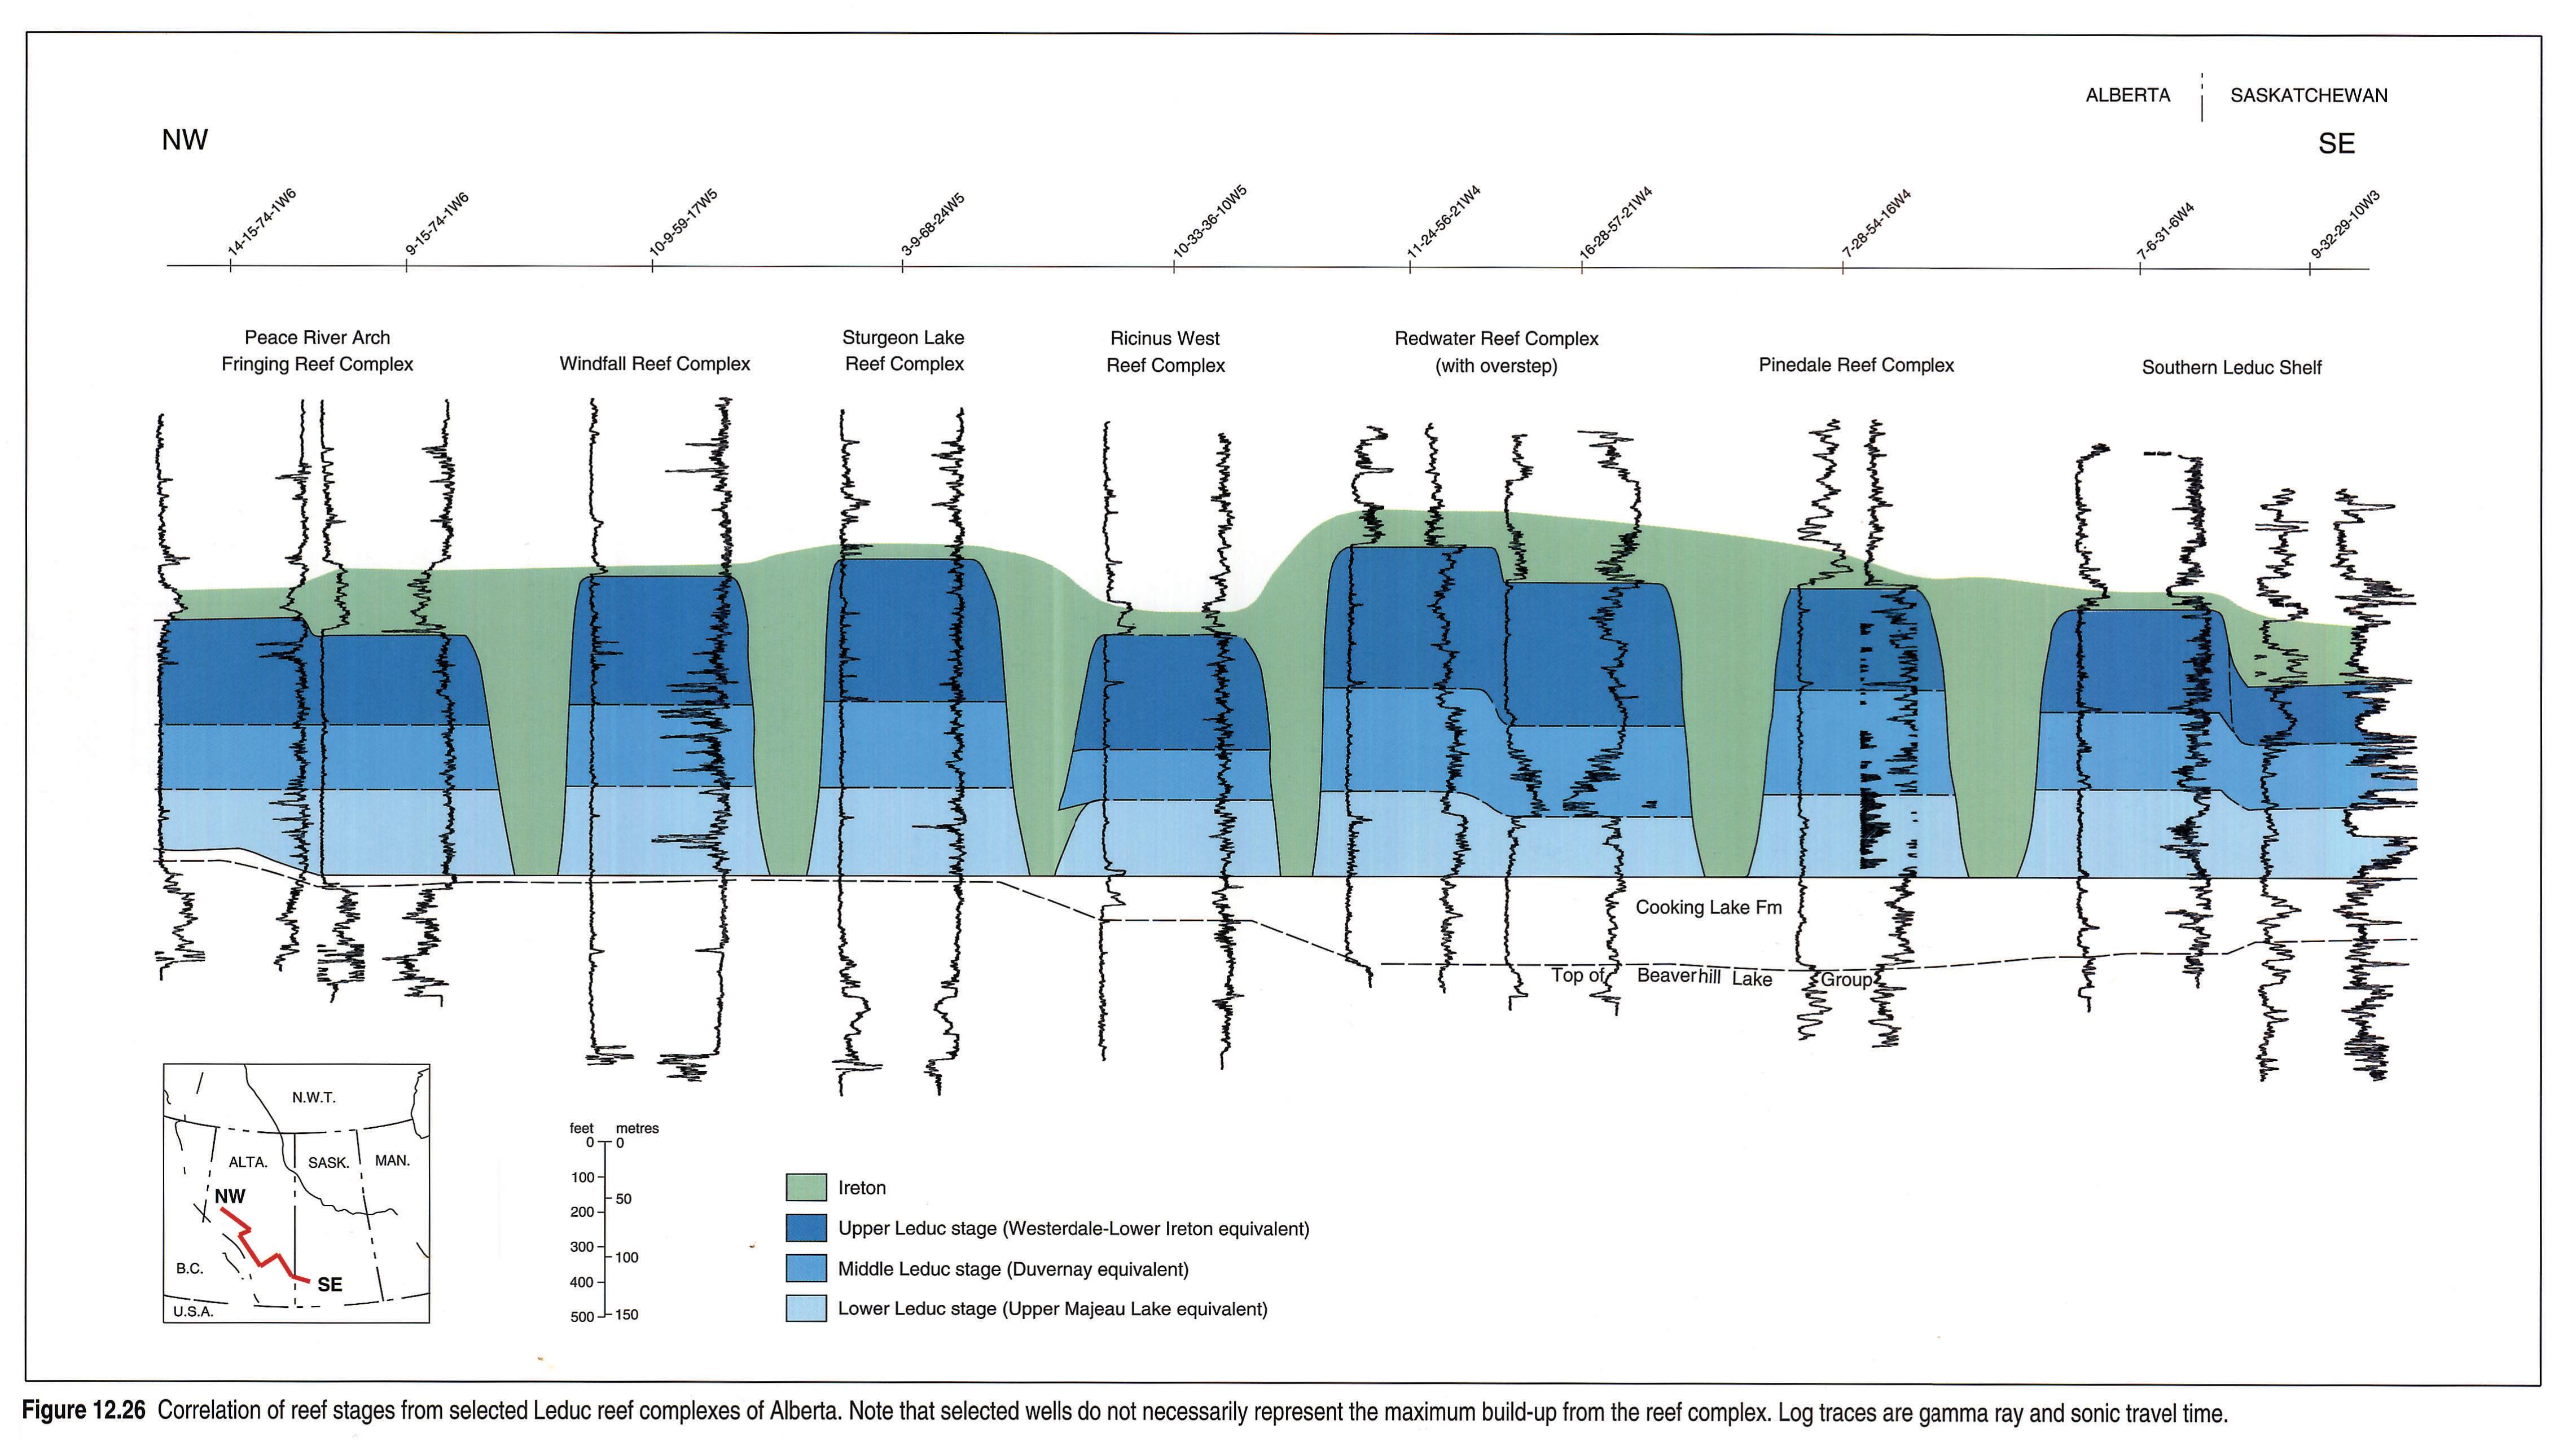 Chapter 12 - Devonian Woodbend-Winterburn Strata